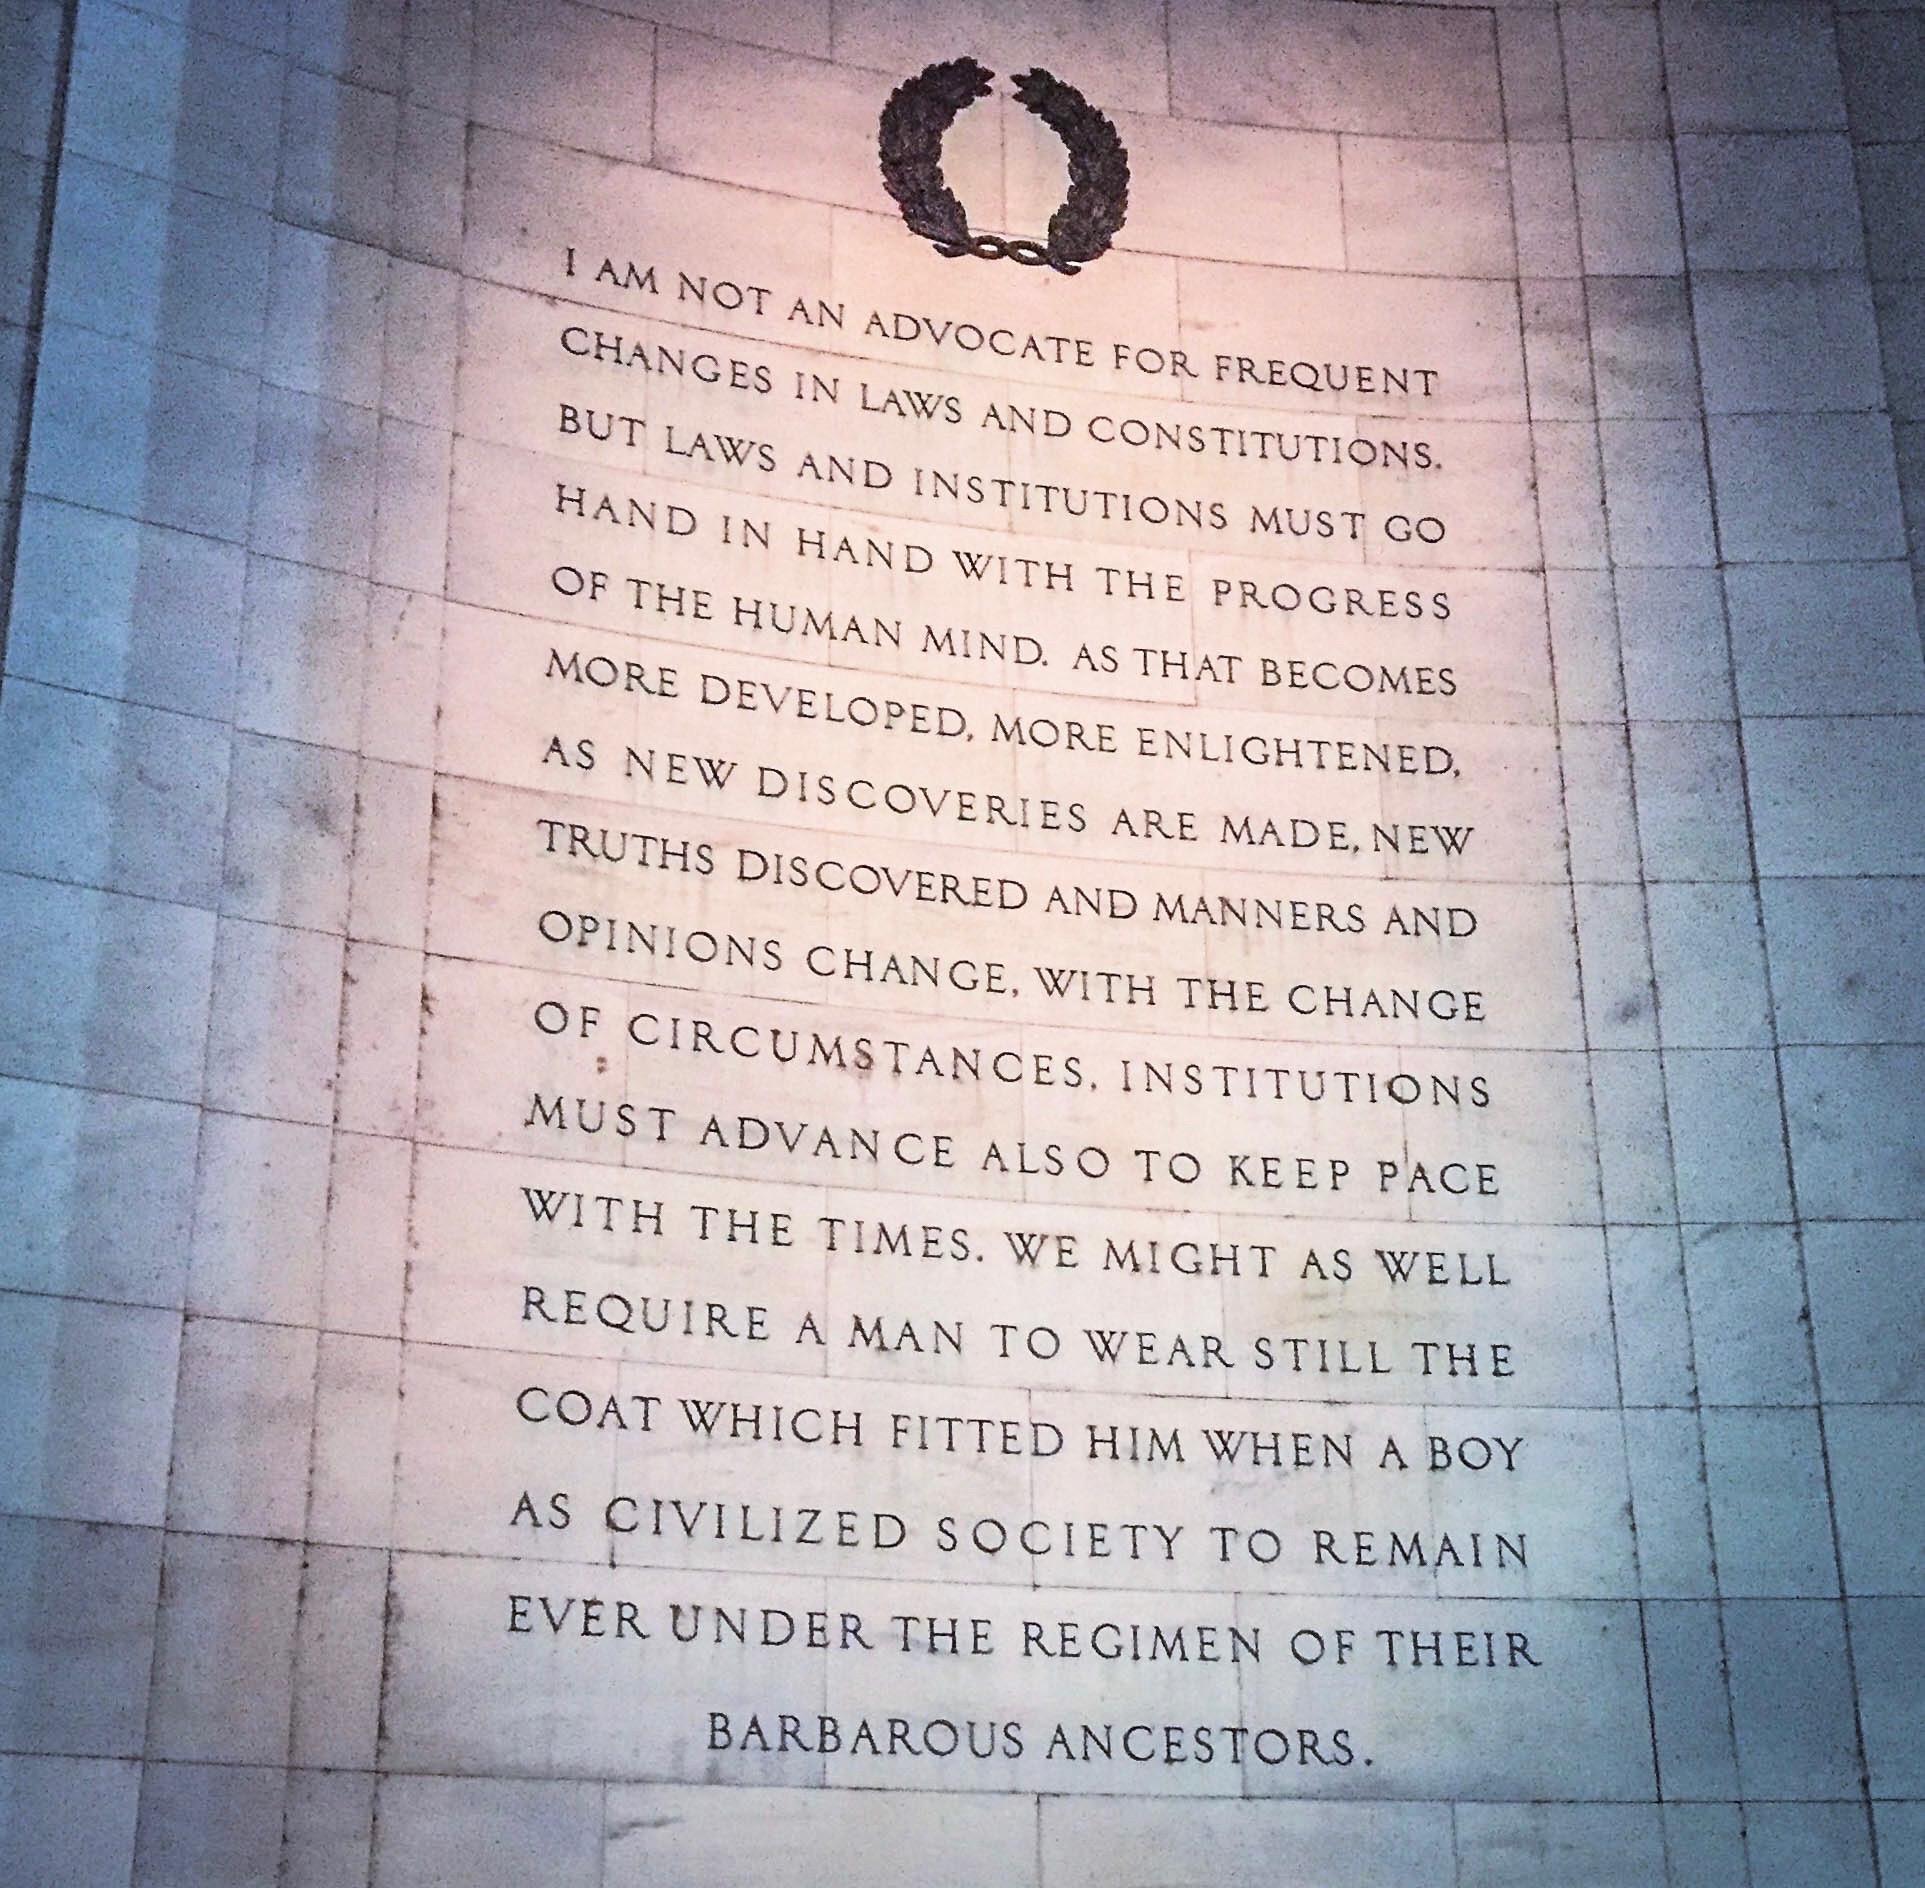 THE JEFFERSON MONUMENT - Washington, DC                                 photo: Joe Center